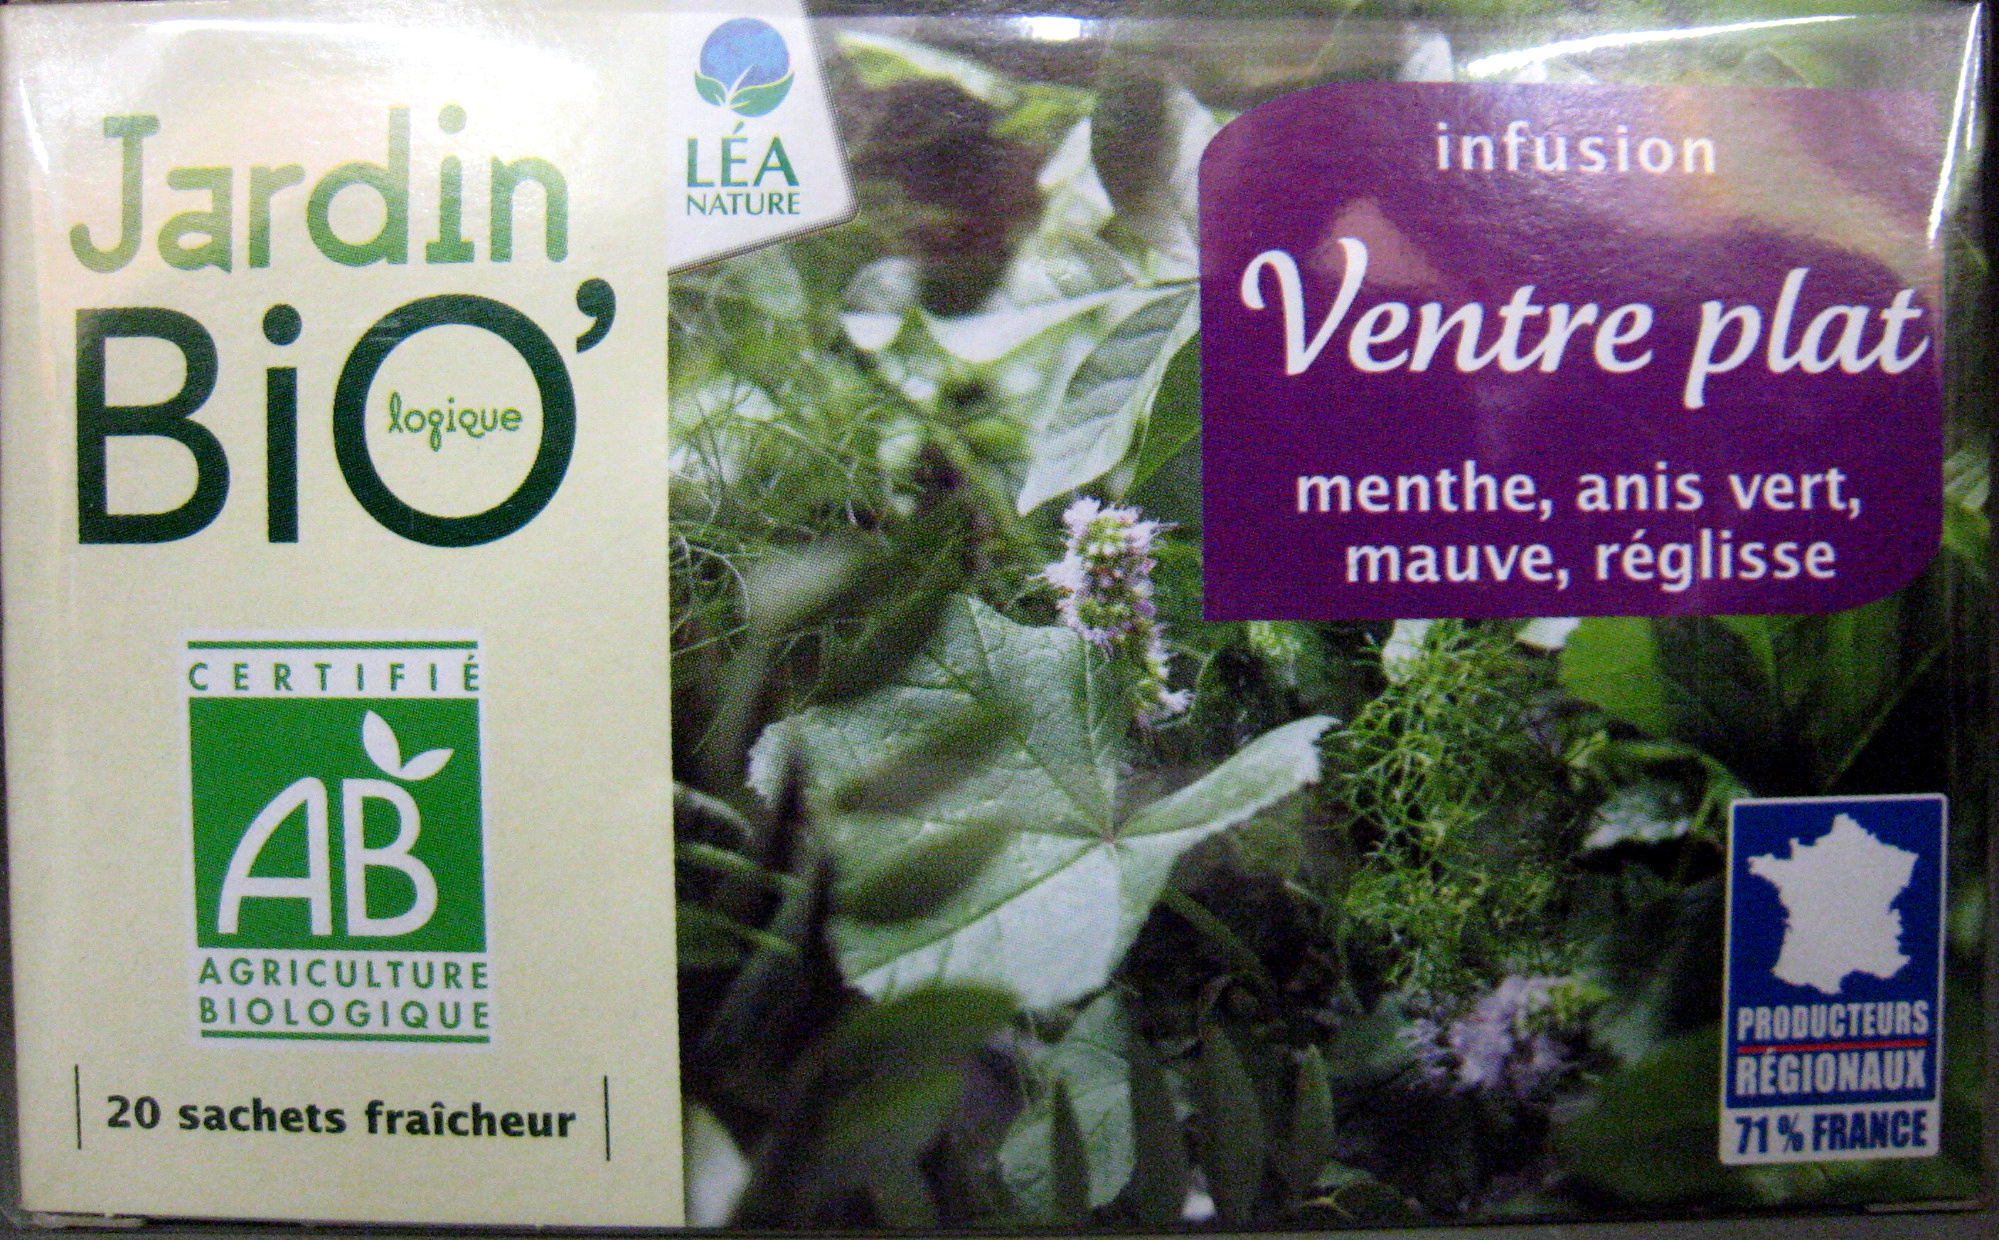 infusion ventre plat jardin bio product - Jardin Bio